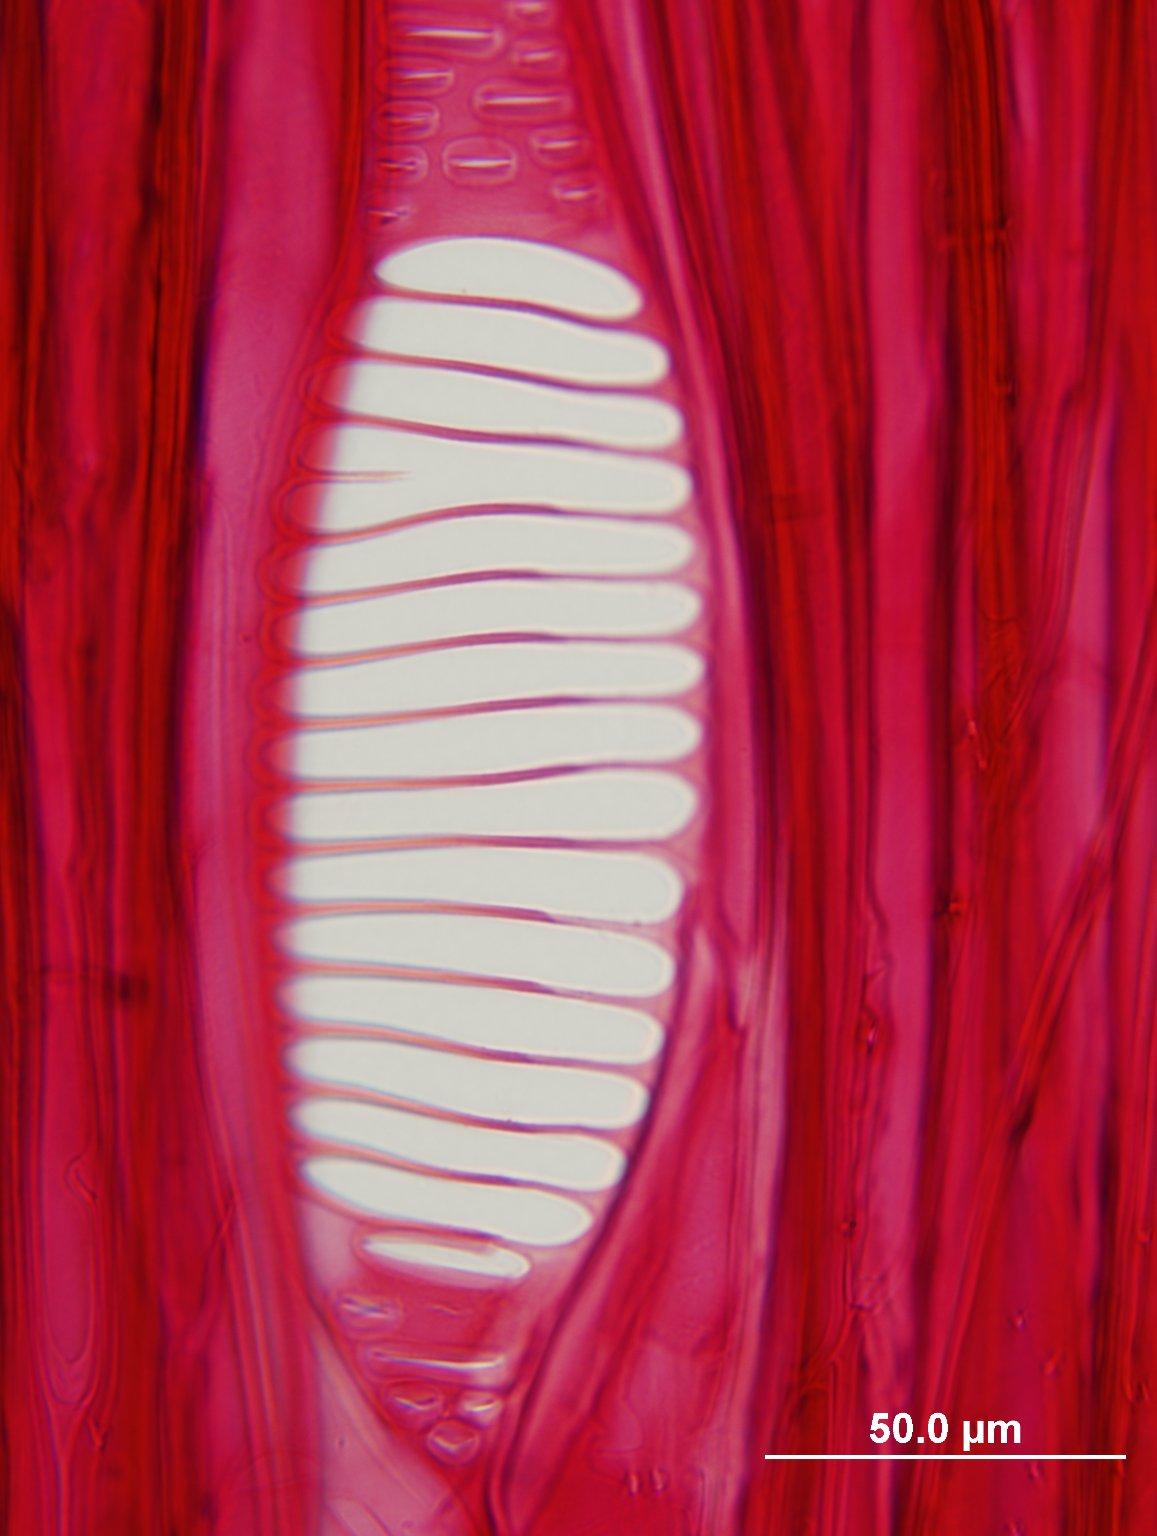 ATHEROSPERMATACEAE Atherosperma moschatum